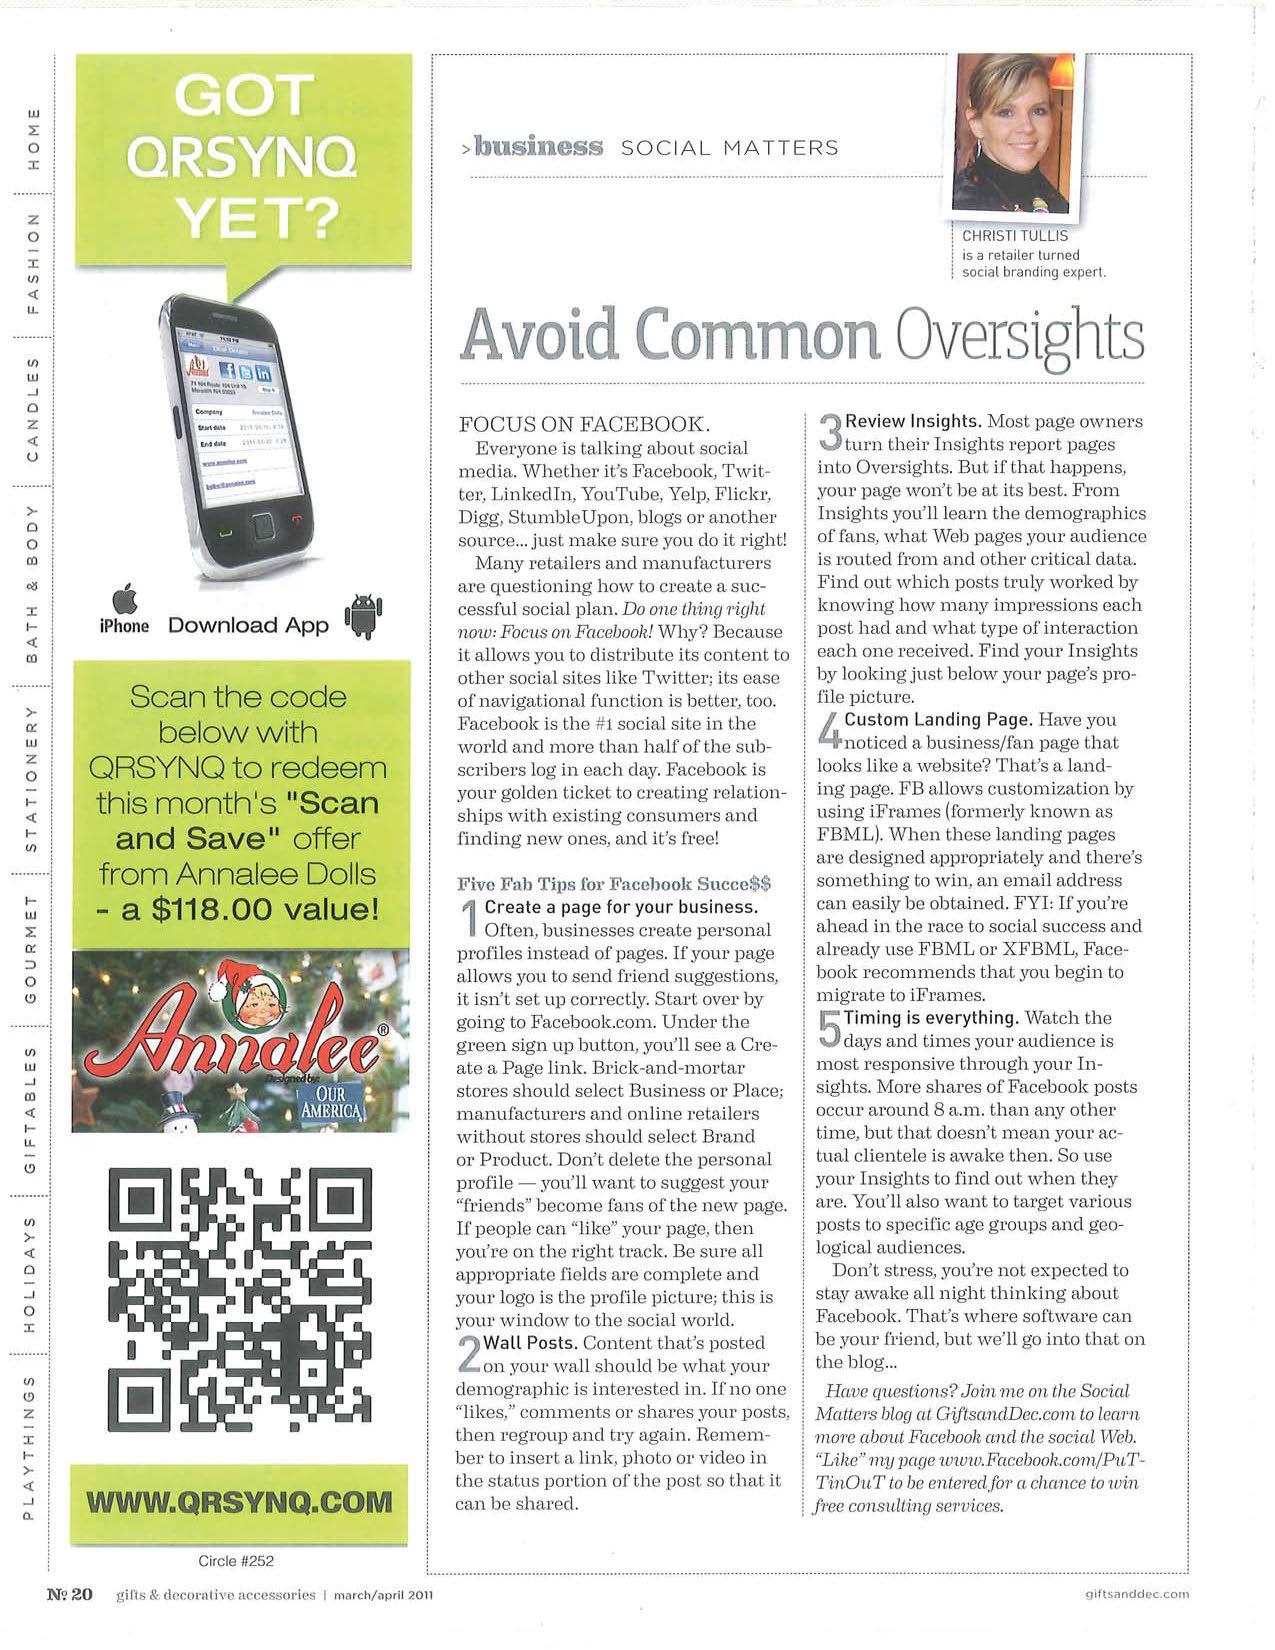 G6D_Apr2011_Article_lores_Page_2